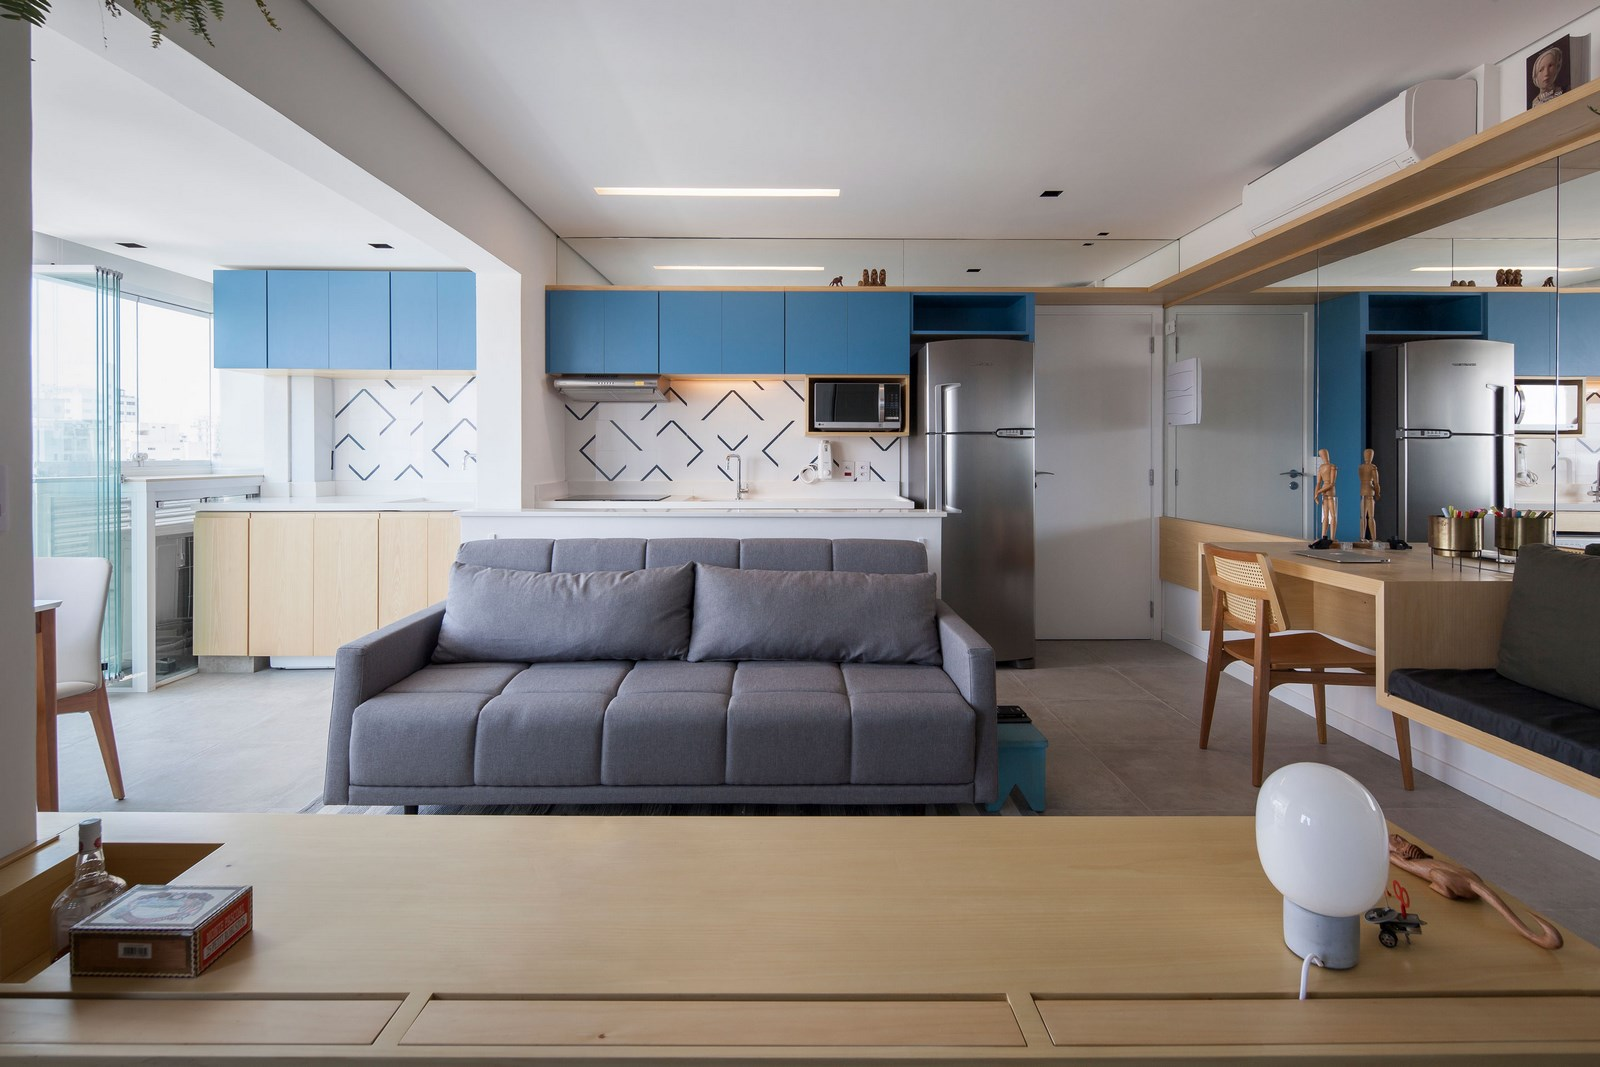 Apartamento Cazo _ Estúdio BRA (10) (Copy)